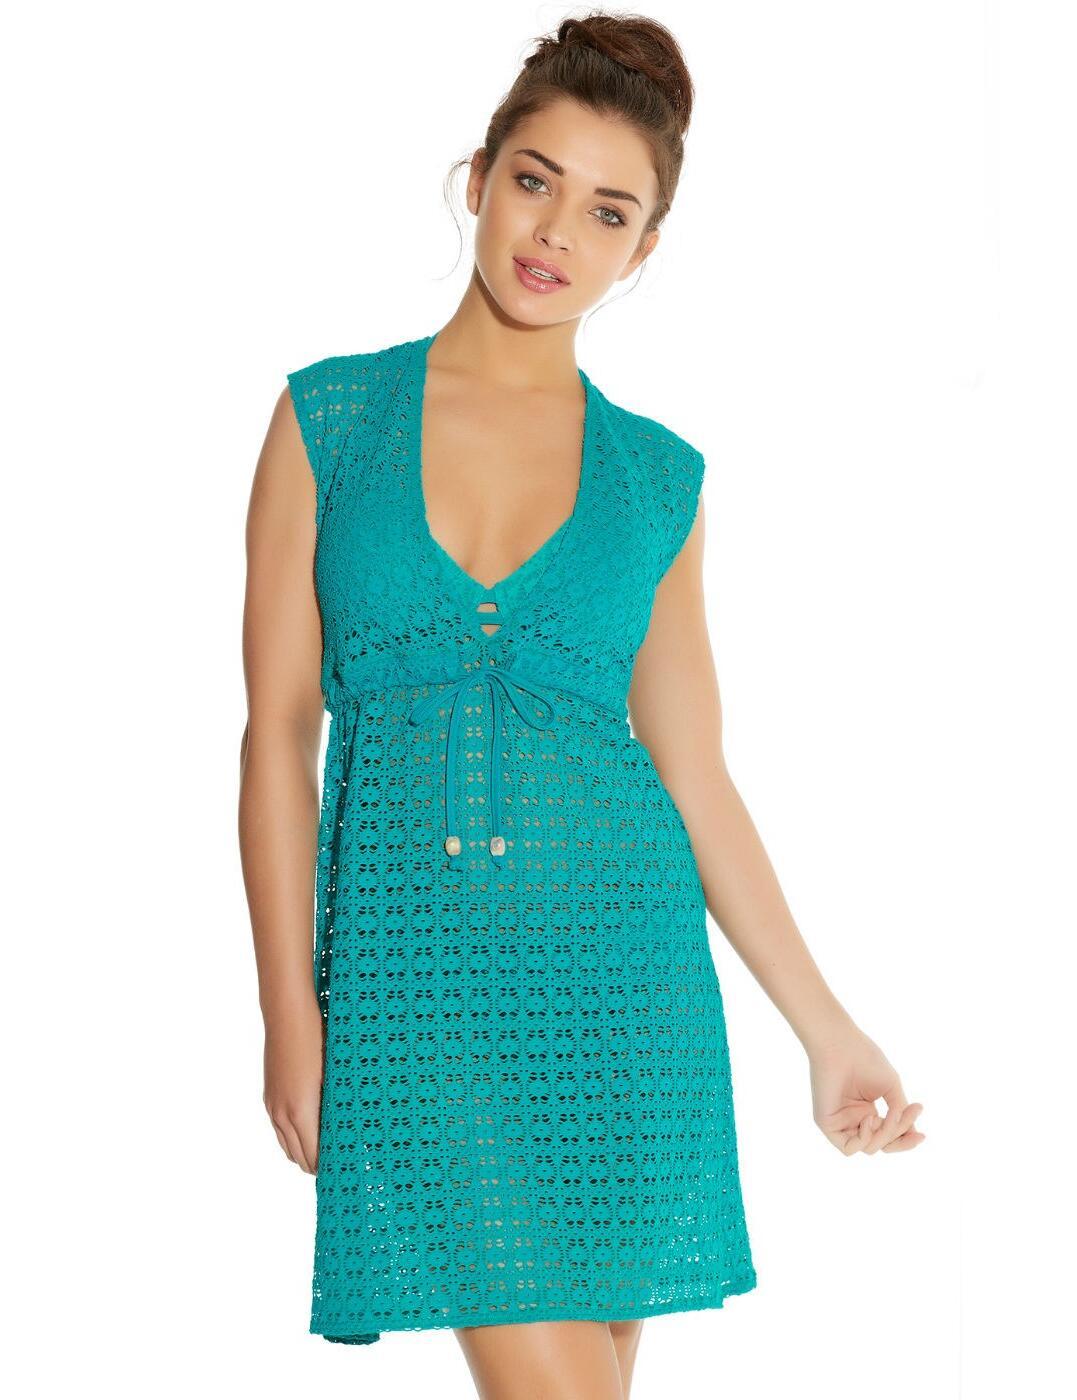 3908 Freya Spirit Beach Tunic Dress - 3908 Jade